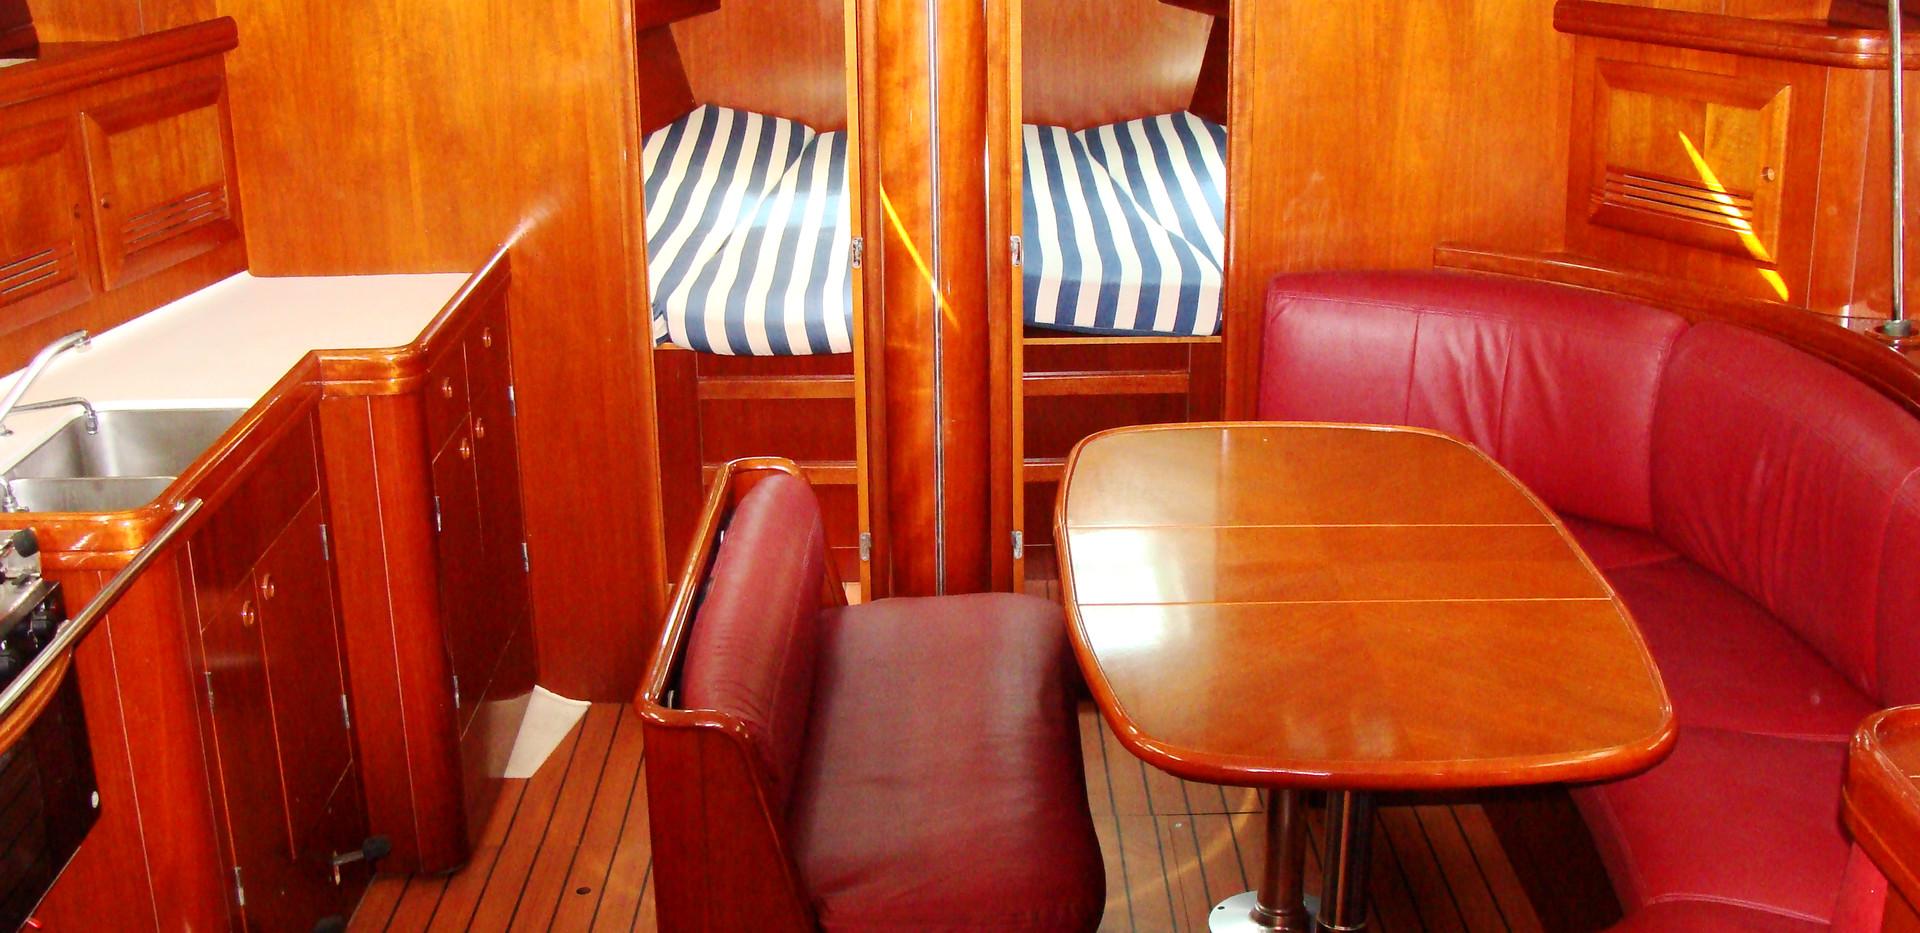 Oceanis 473 Sailing Yacht Interior 1.JPG